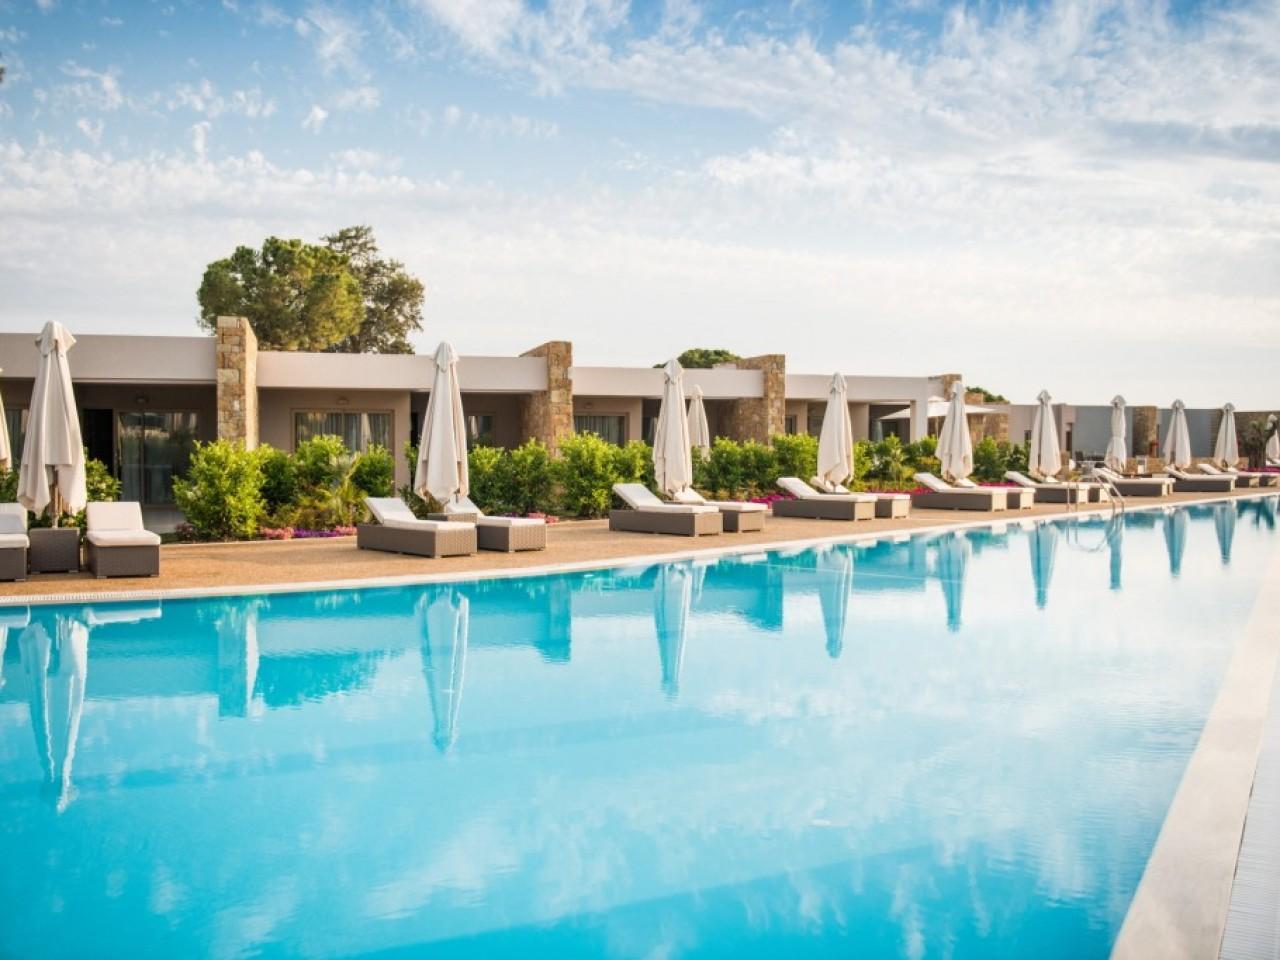 Luxurious Hotels in Halkidiki